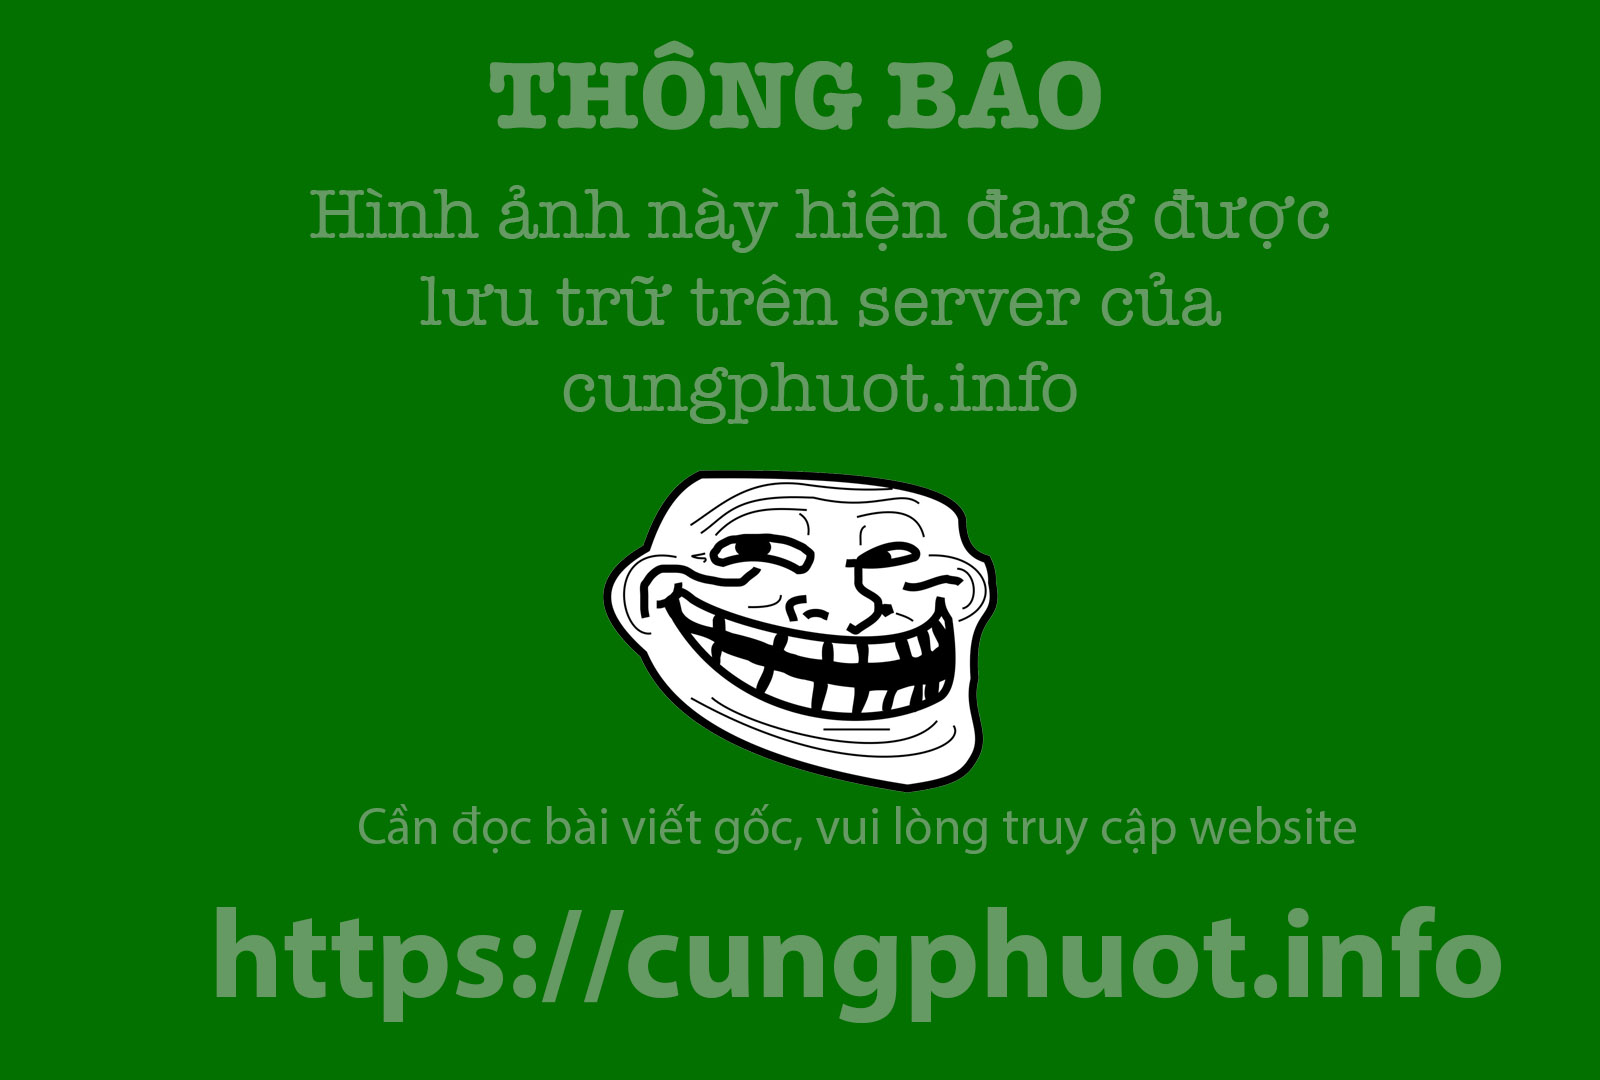 Chon bien cuong 'troi thap, dat cao' o Nam Can hinh anh 3